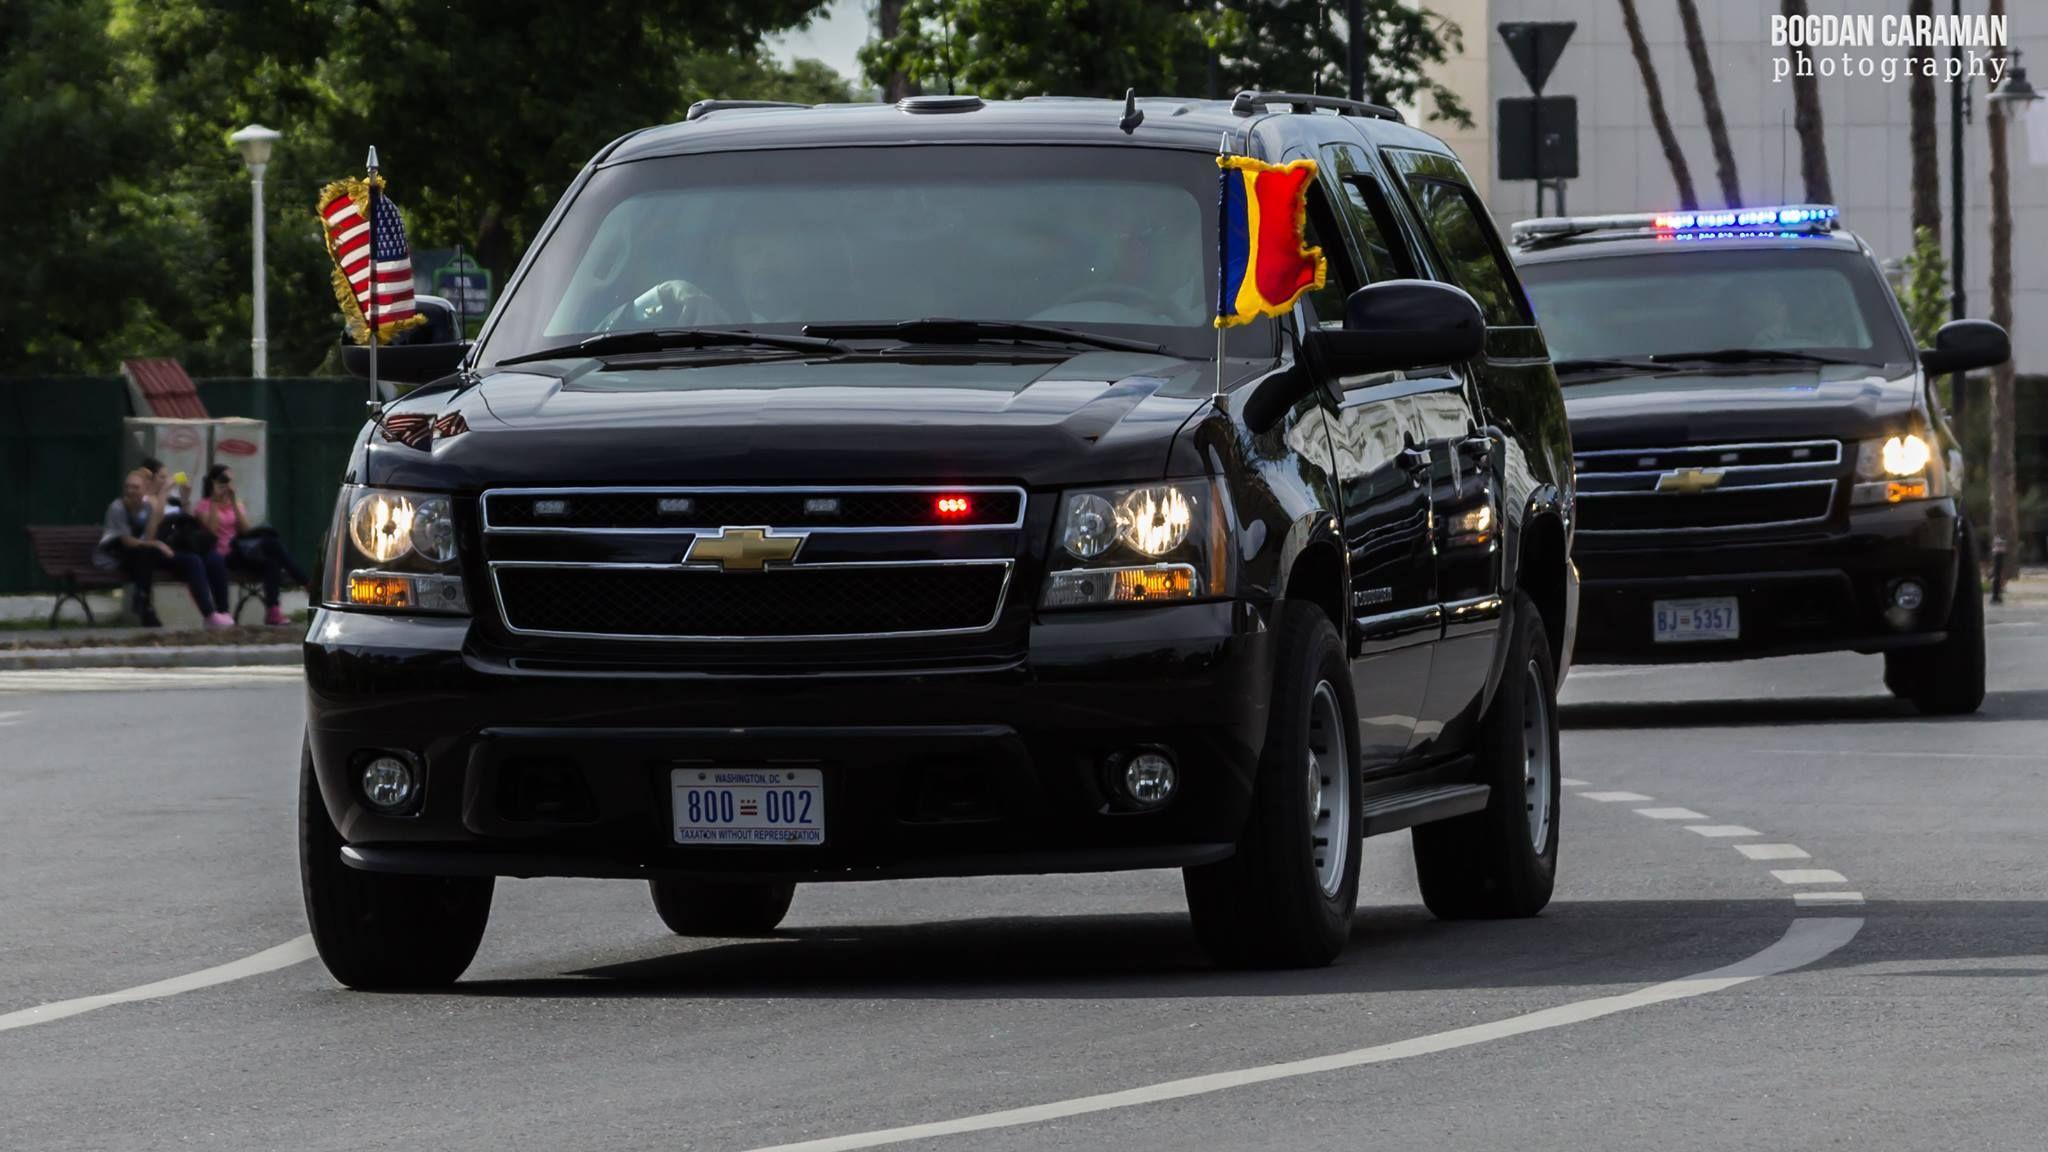 Secret Service Vehicle Bogdan Caraman Photography